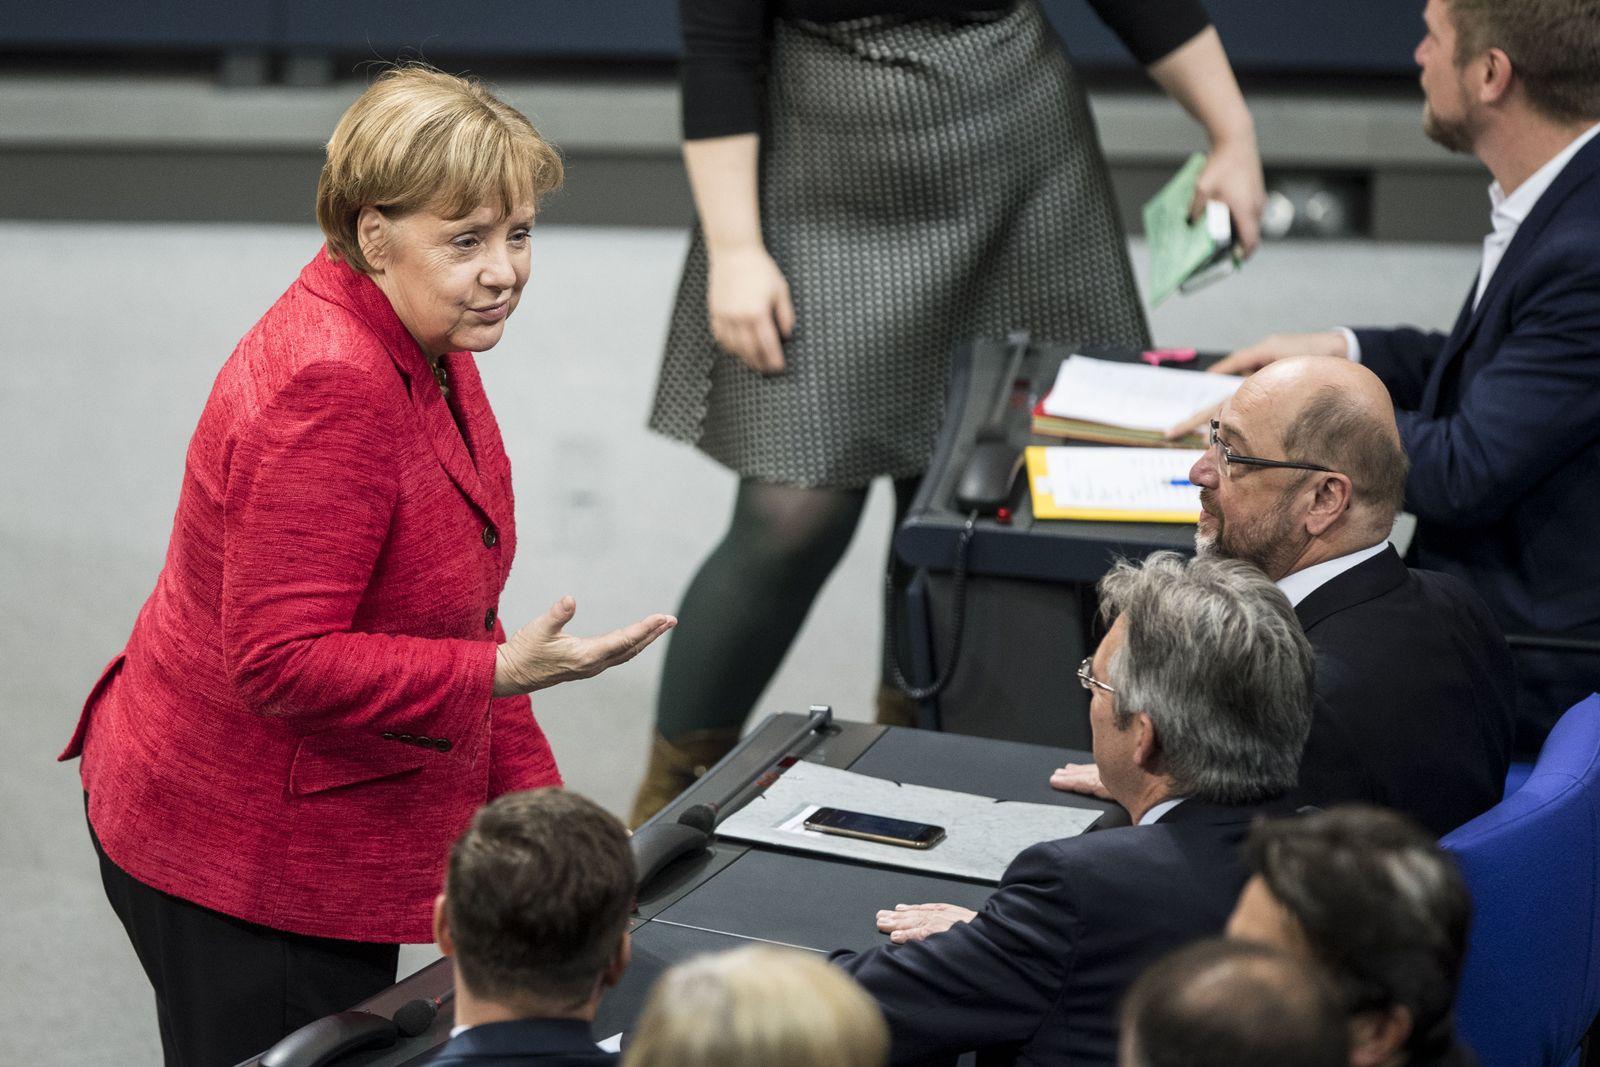 Angela Merkel / Martin Schulz